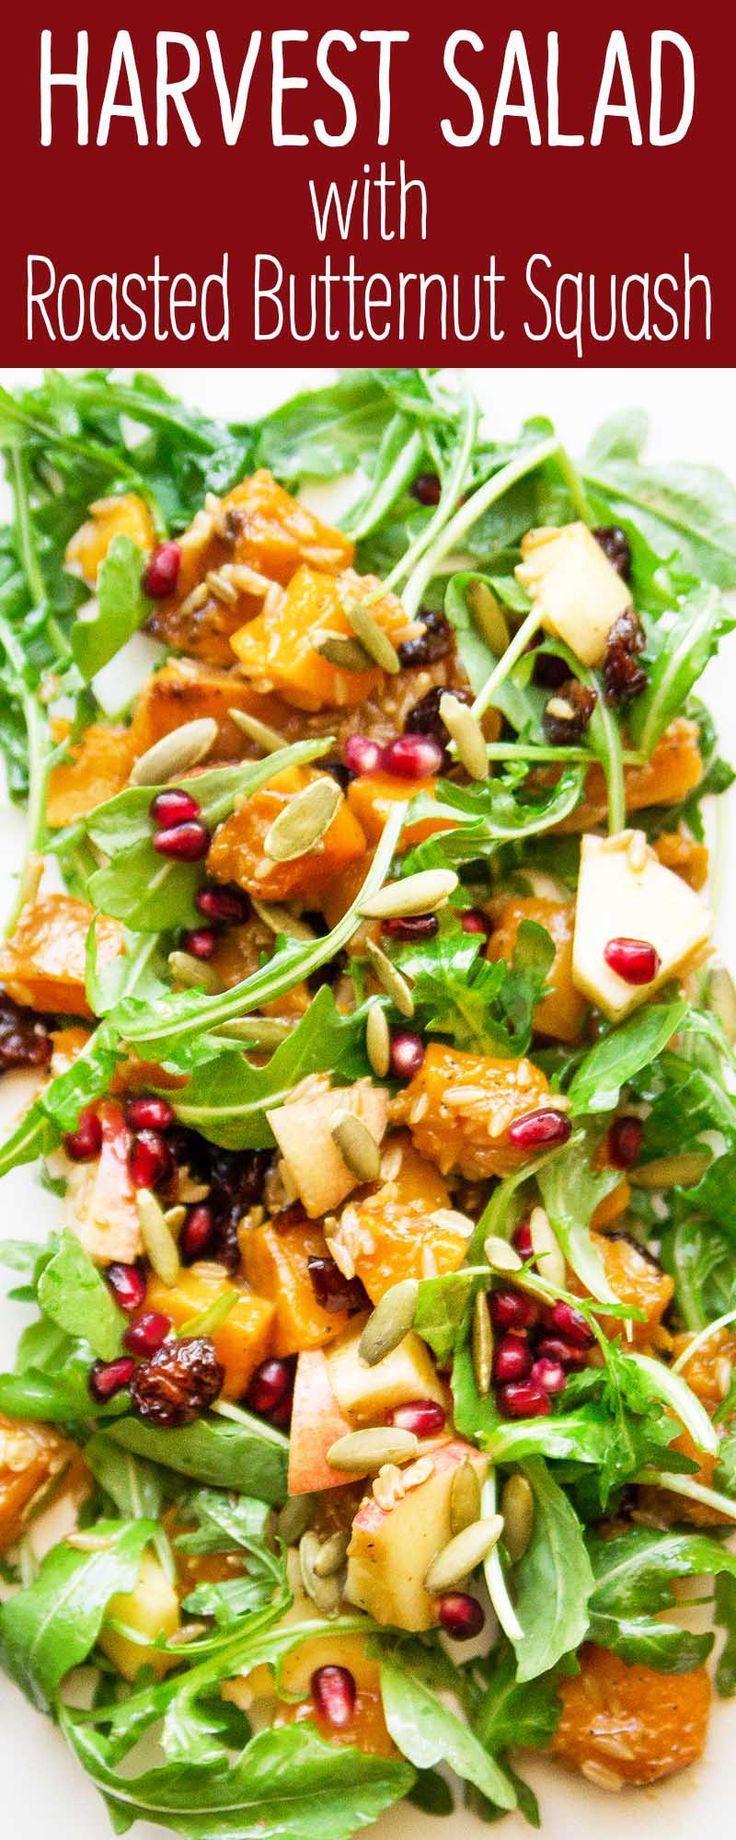 Harvest Salad with Miso-Maple Roasted Butternut Squash #vegetarian #vegan